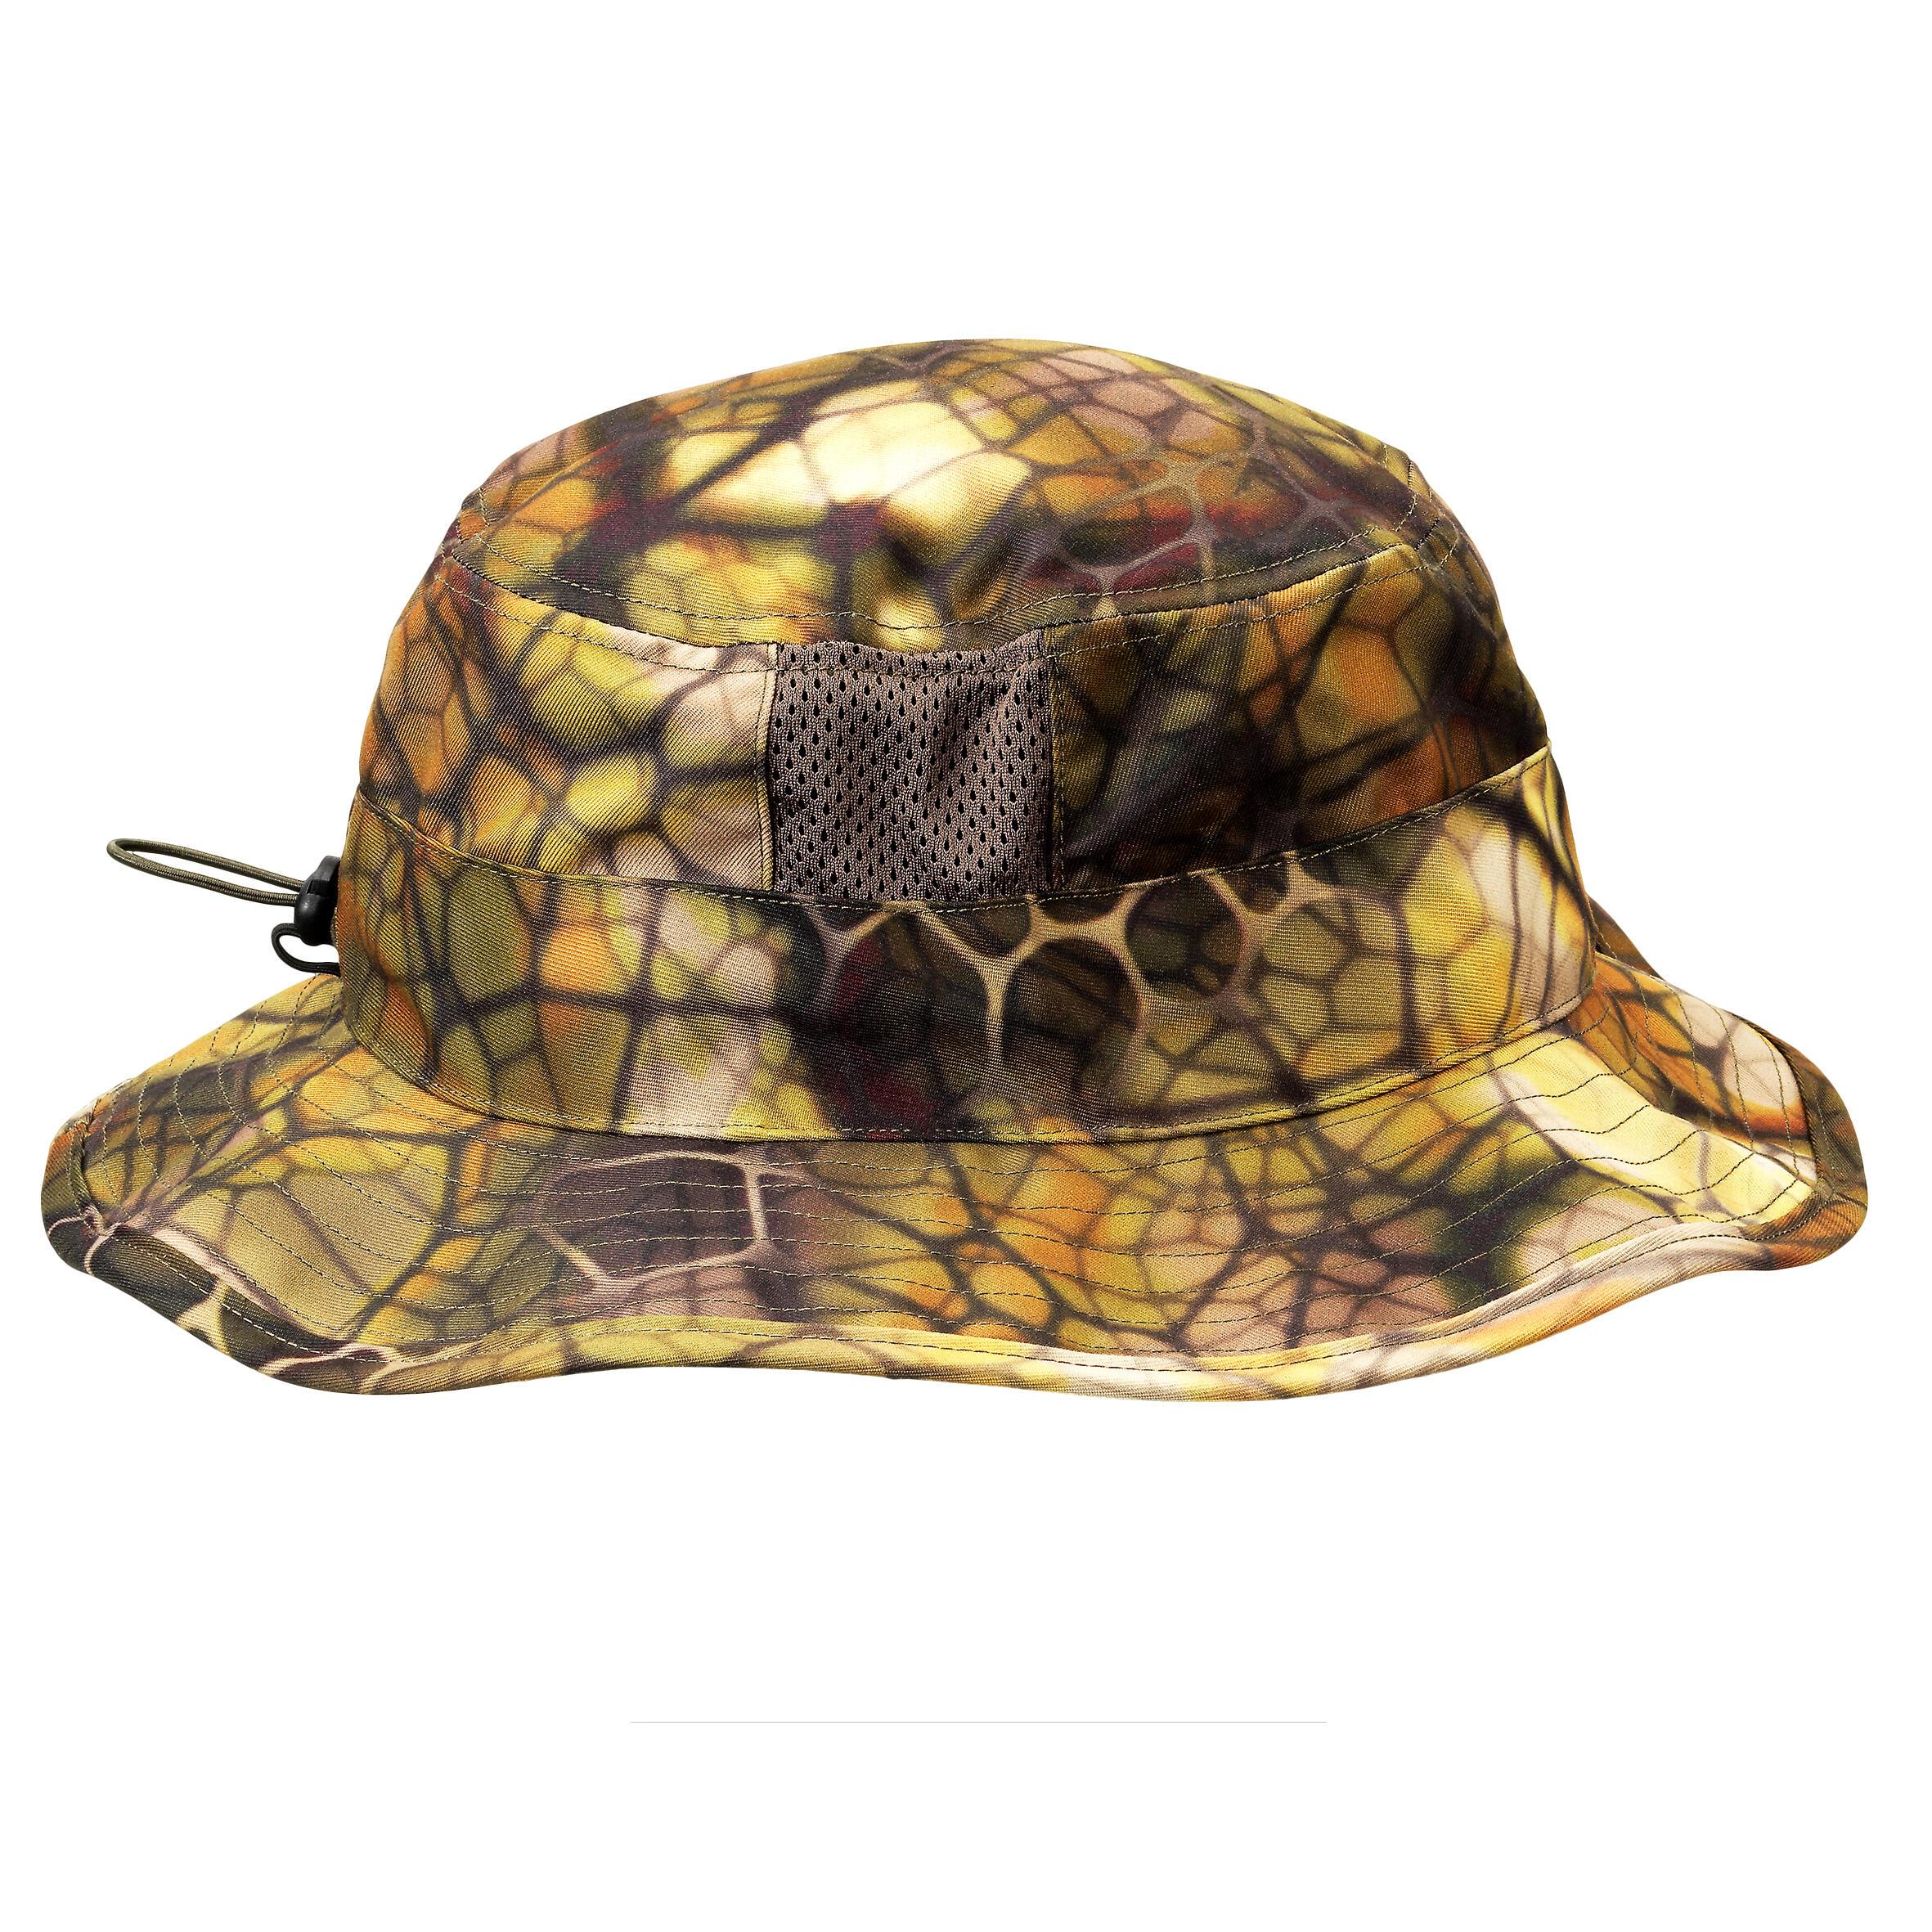 3ff45d3fac1bf Comprar Sombreros para Deporte